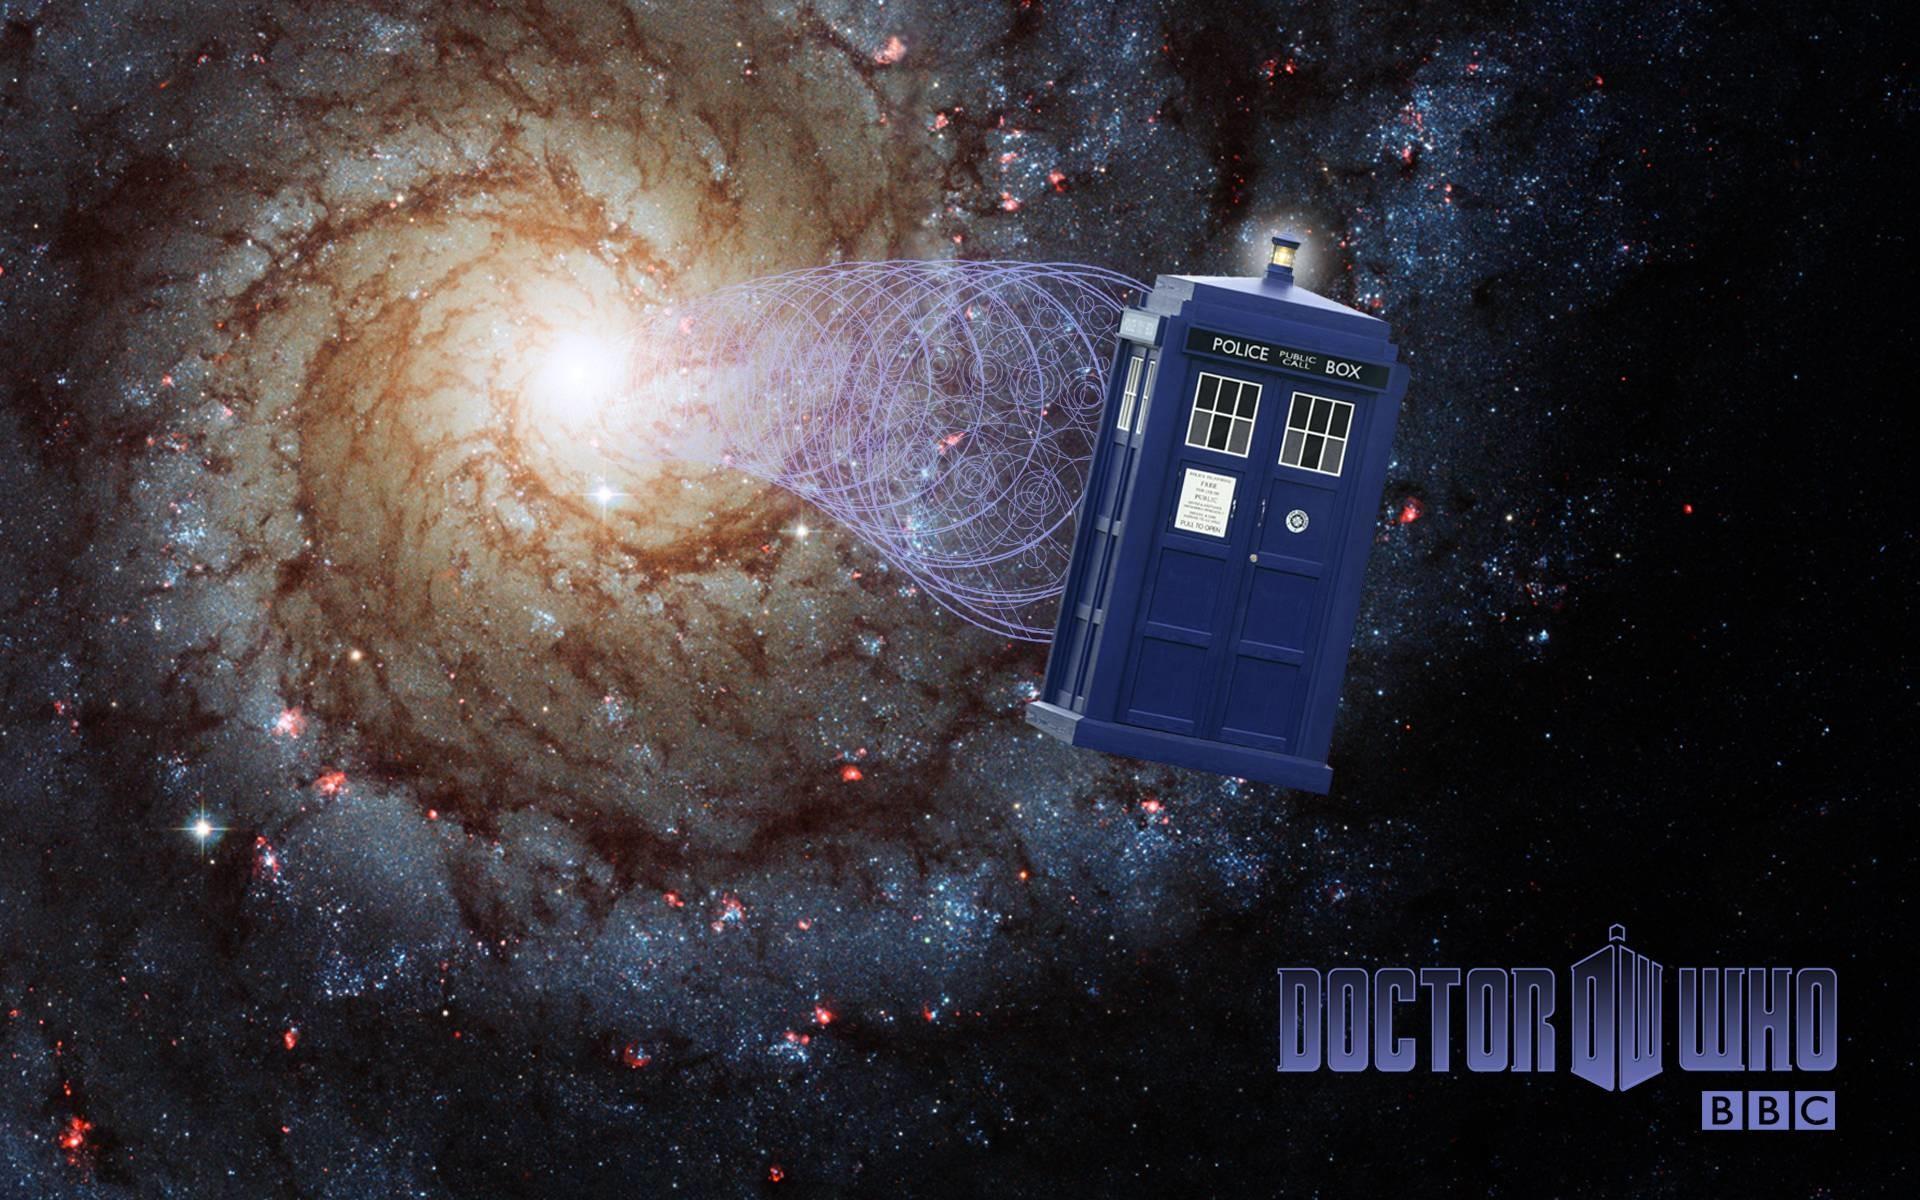 Doctor Who Wallpapers Tardis #8776675